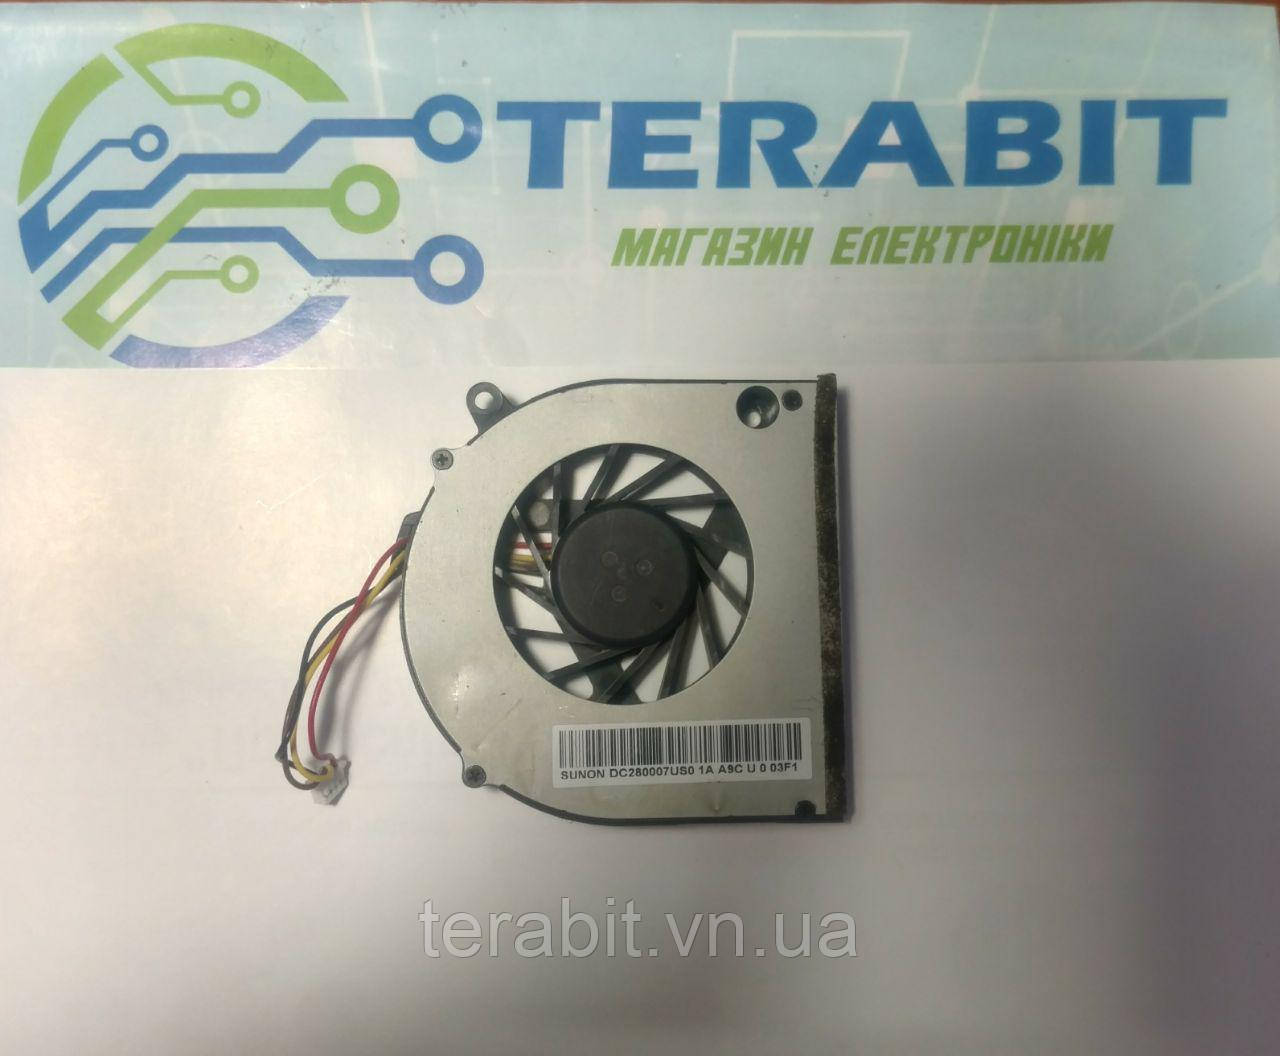 Кулер (вентилятор) для ноутбука LENOVOG560 G565 Z560 Z565